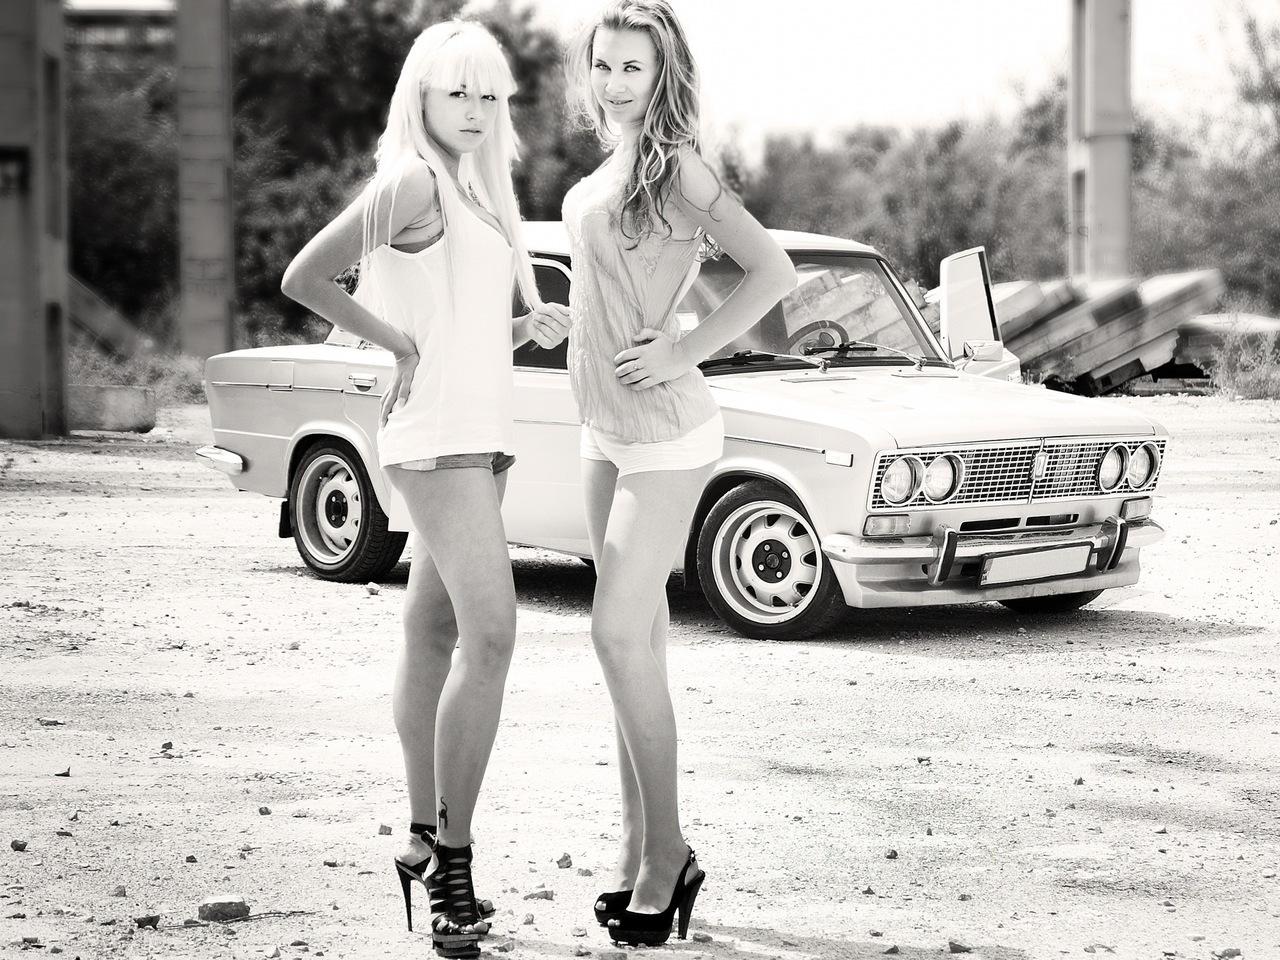 Pretty Lada Samara girls